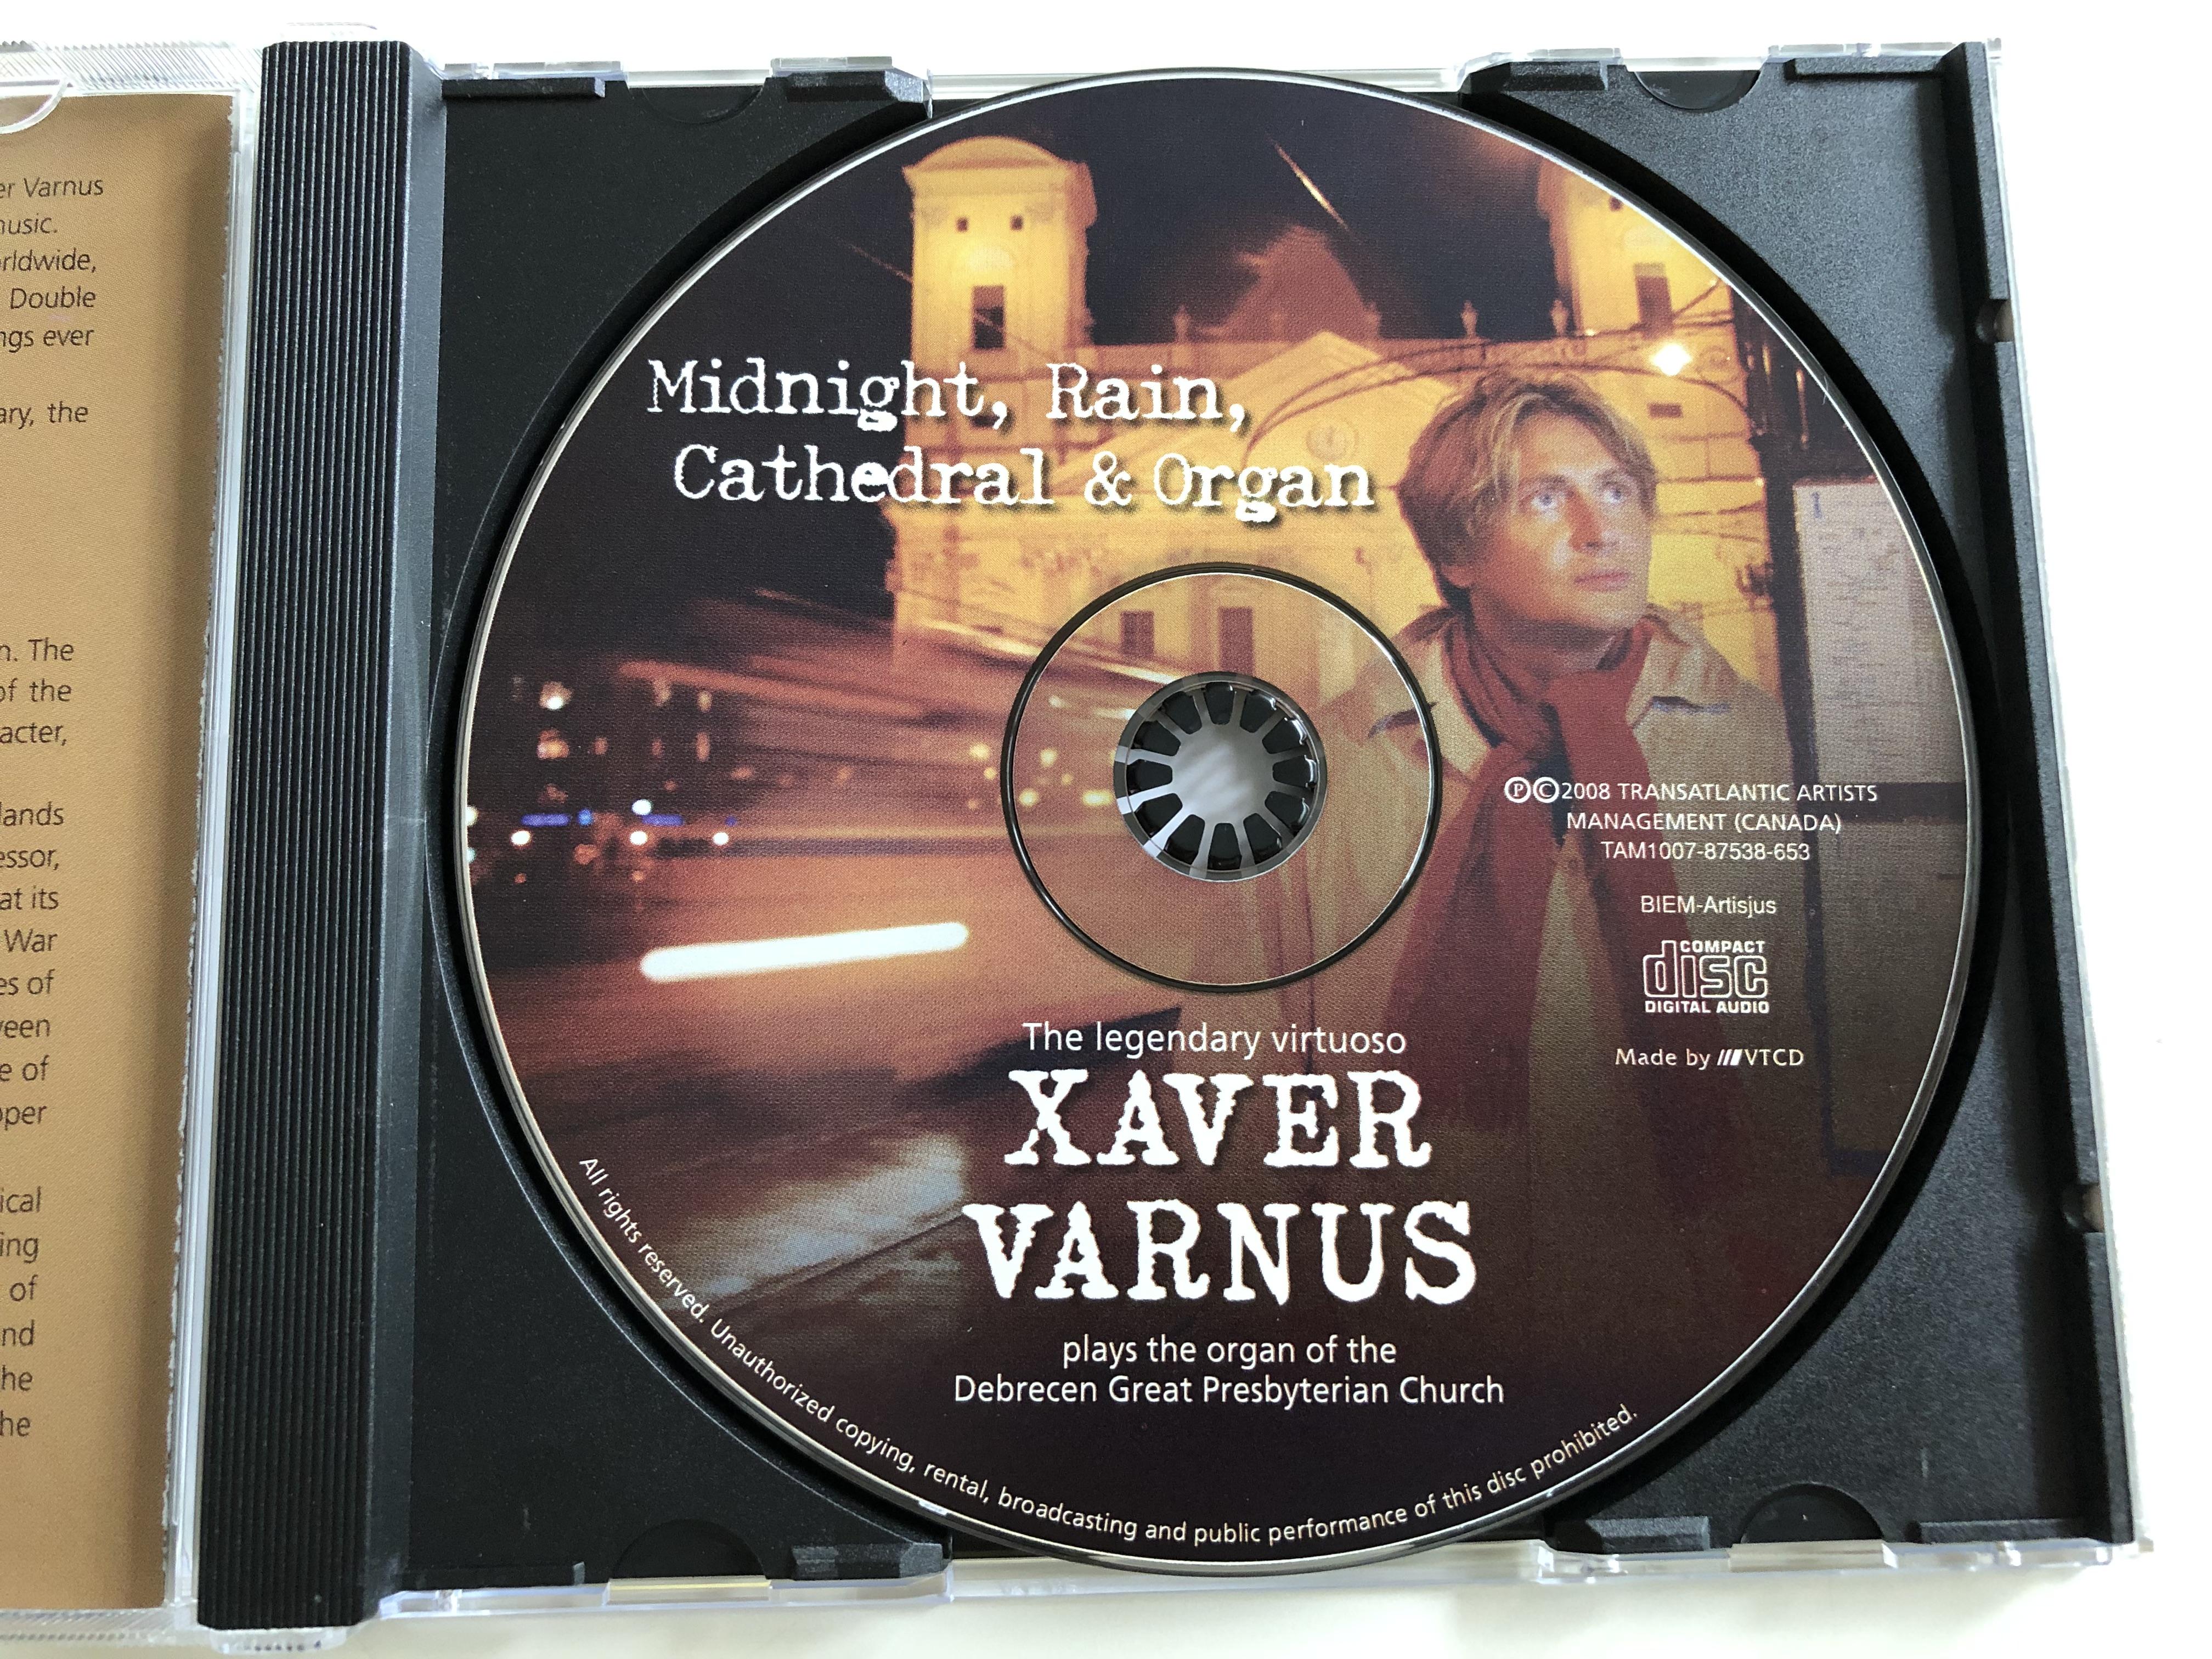 xaver-vanus-midnight-rain-cathedral-organ-the-legendary-virtuoso-plays-the-organ-of-the-debrecen-great-presbyterian-church-audio-cd-2008-tam-release-tam-1007-87538-653-5-.jpg